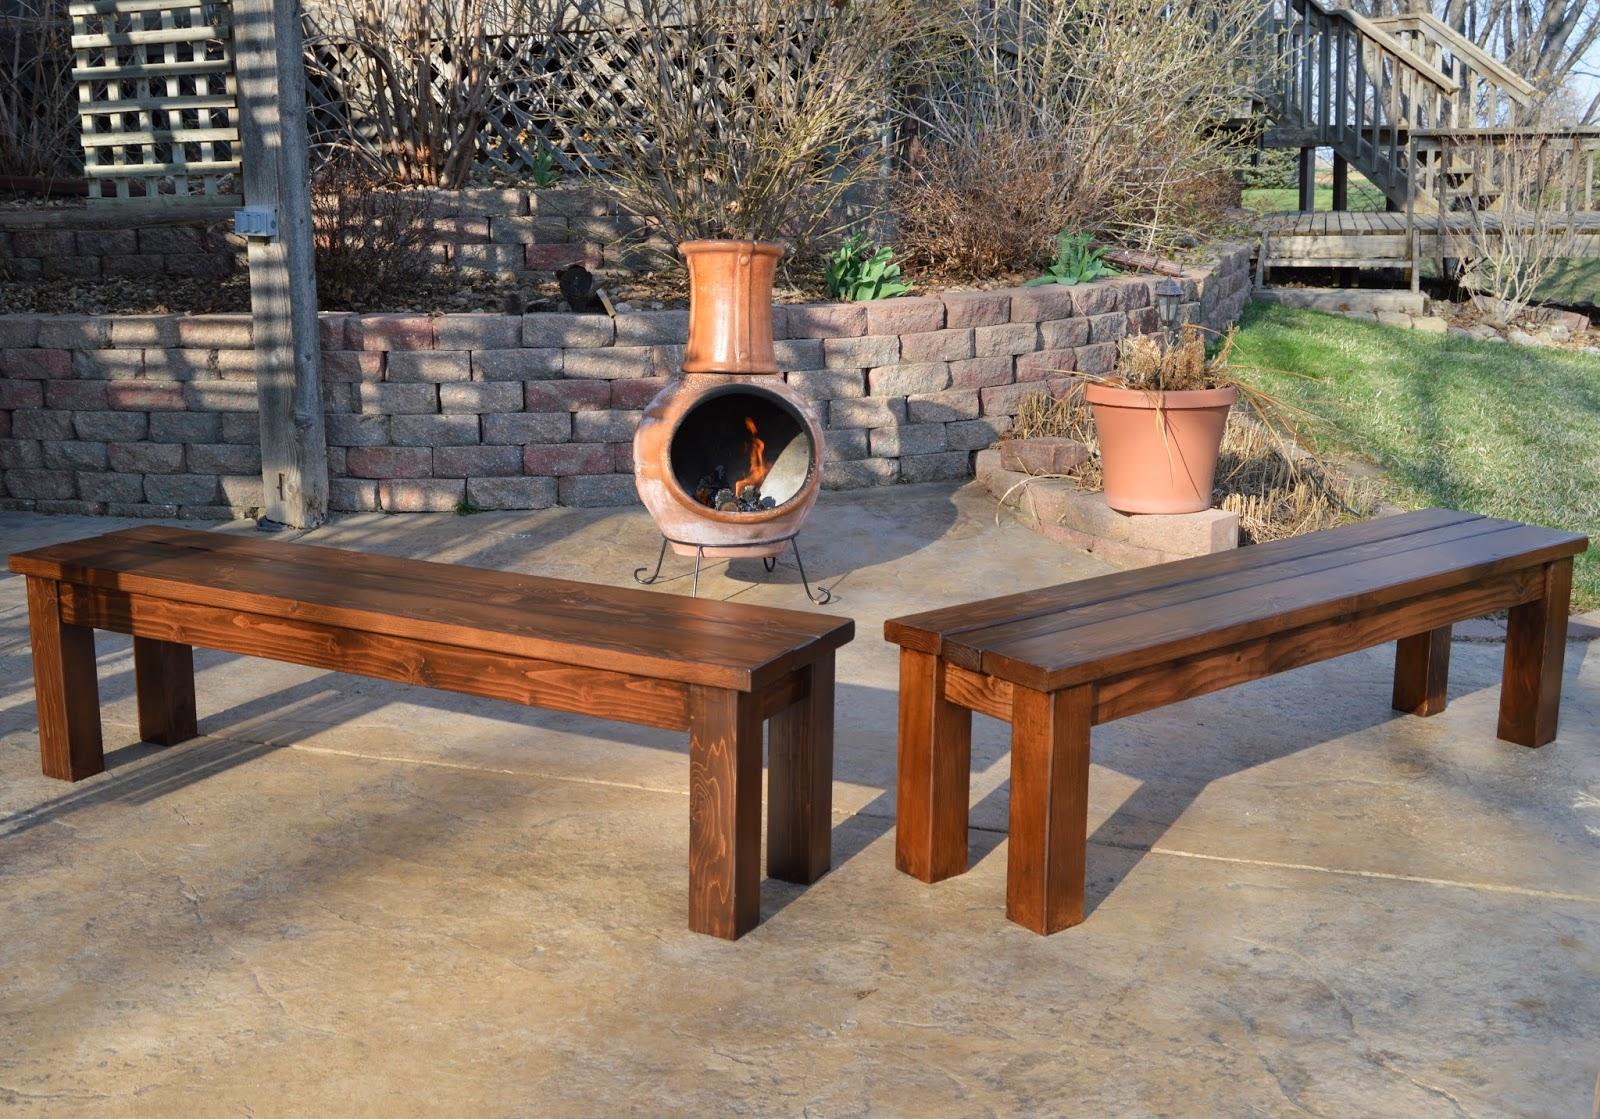 Superior Rustic Bench Ideas Part - 14: Kruseu0027s Workshop